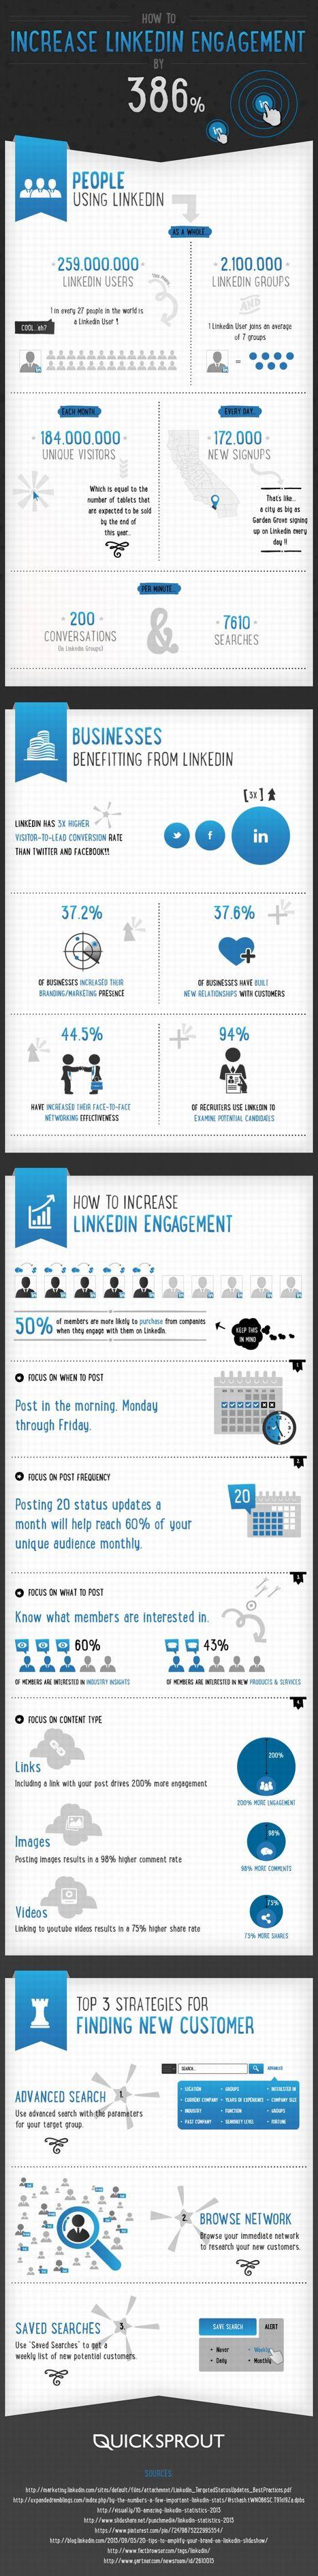 ENGAGEMENT on LinkedIn [INFOGRAPHIC]   Social Media e Innovación Tecnológica   Scoop.it